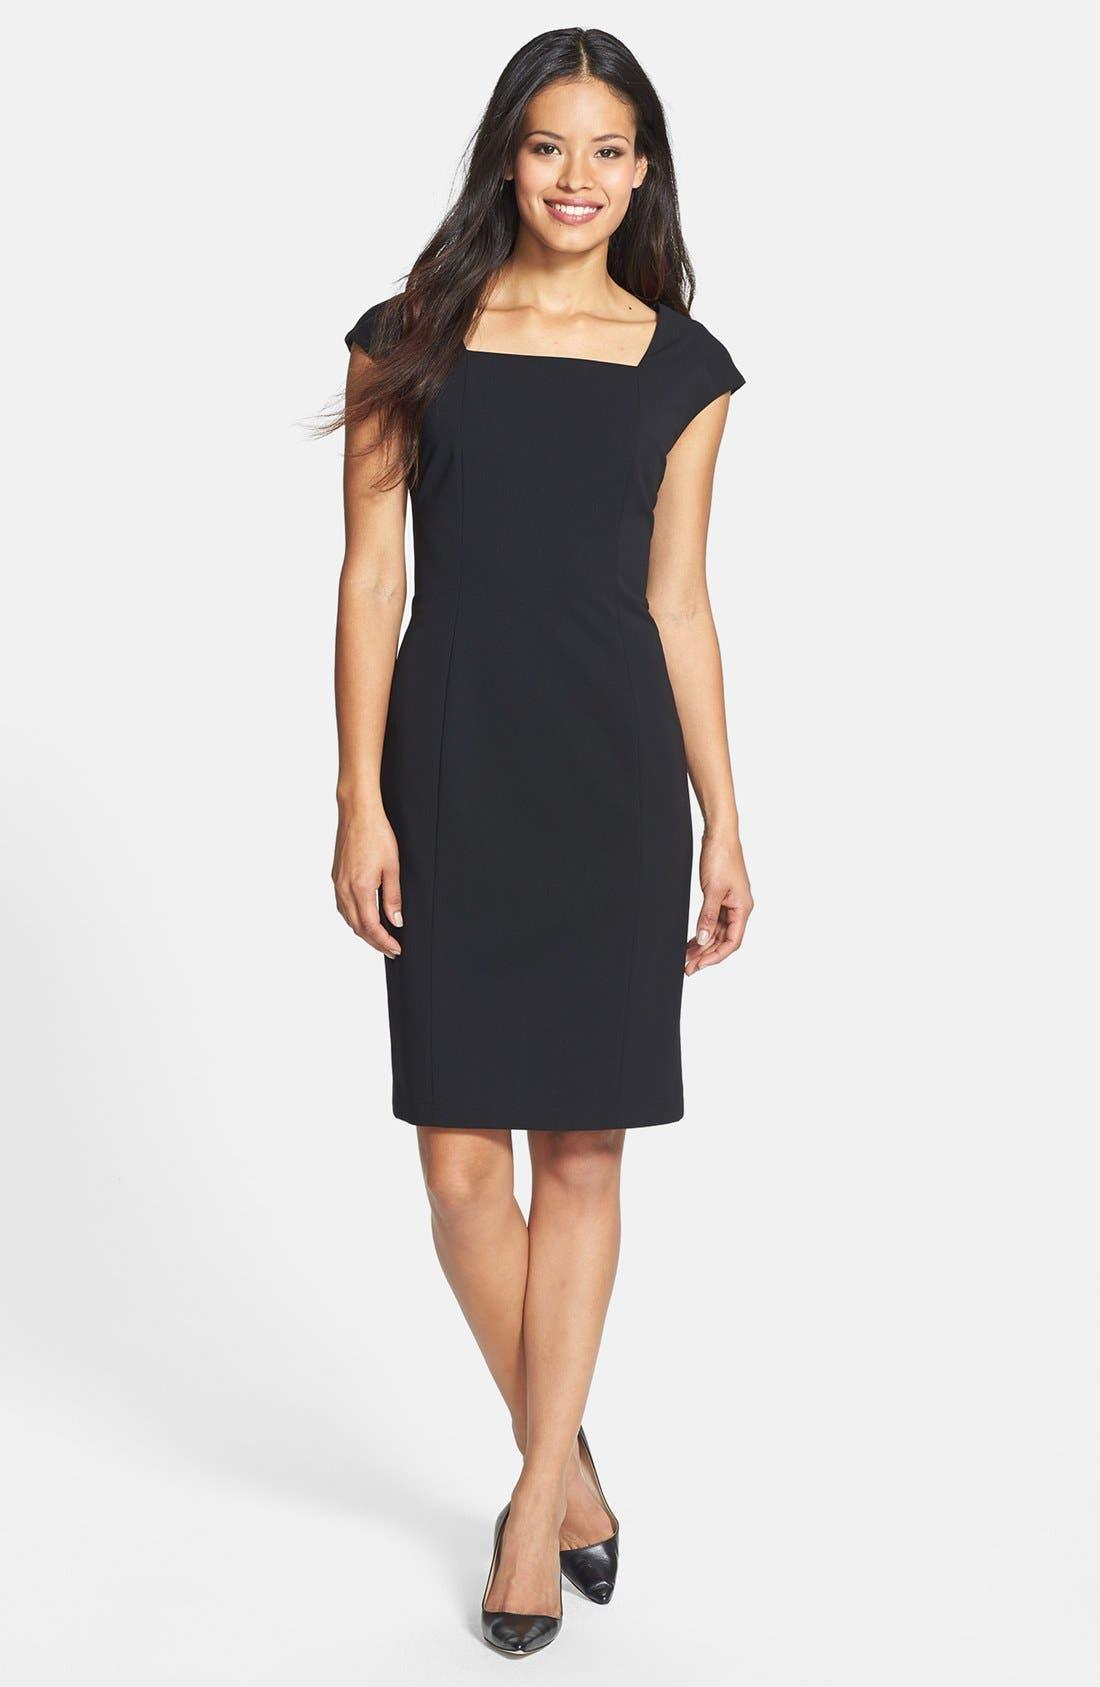 Alternate Image 1 Selected - Lafayette 148 New York Square Neck Knit Sheath Dress